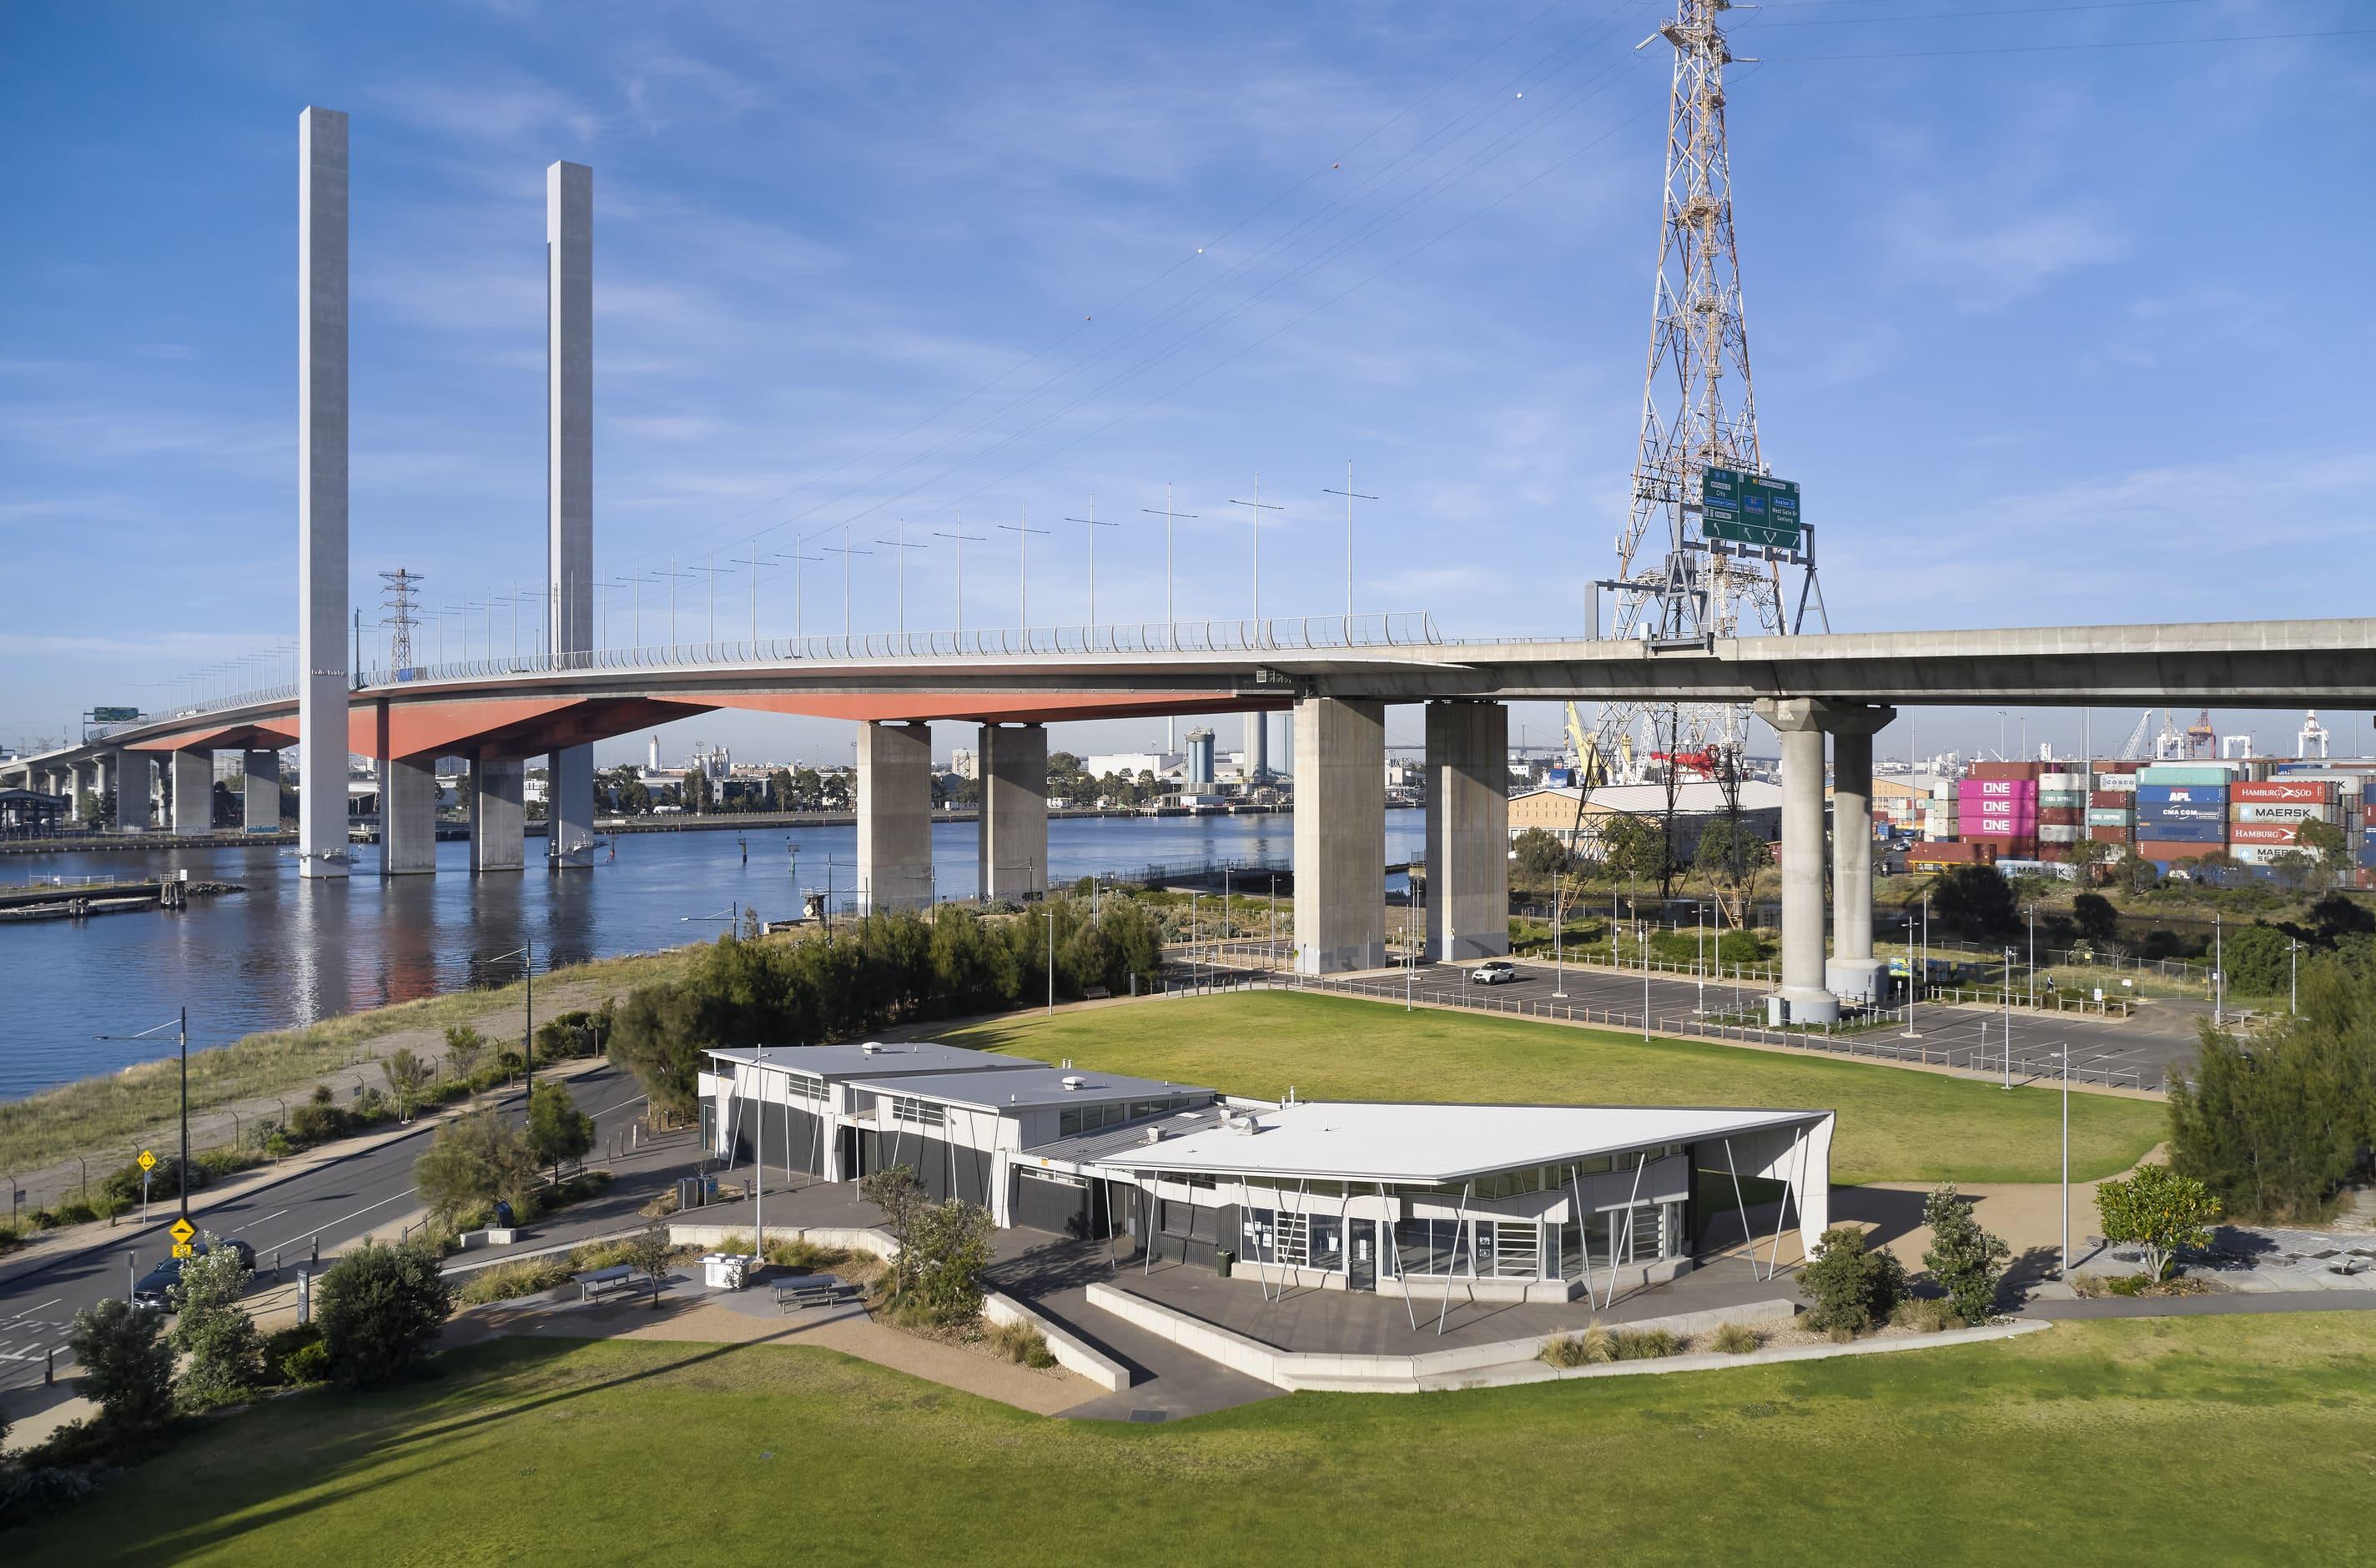 2Construct - Docklands Pavilion 01